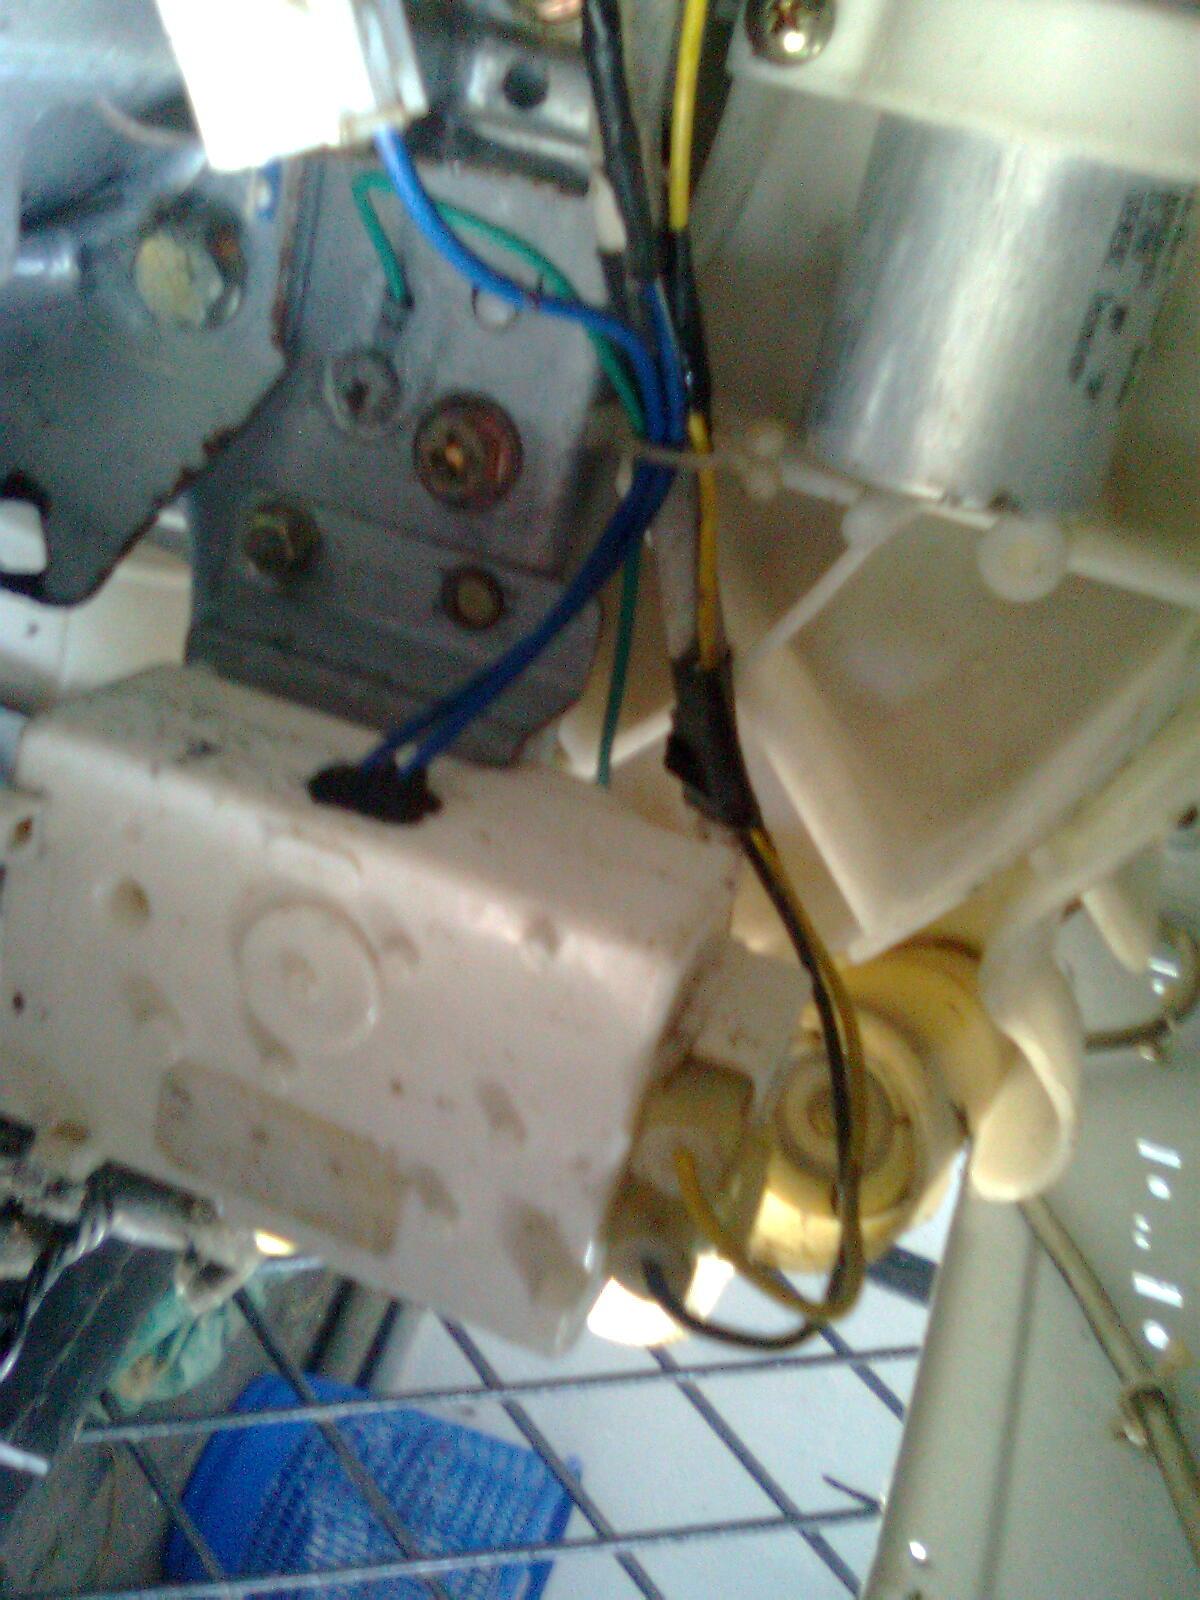 kochi ernakulam washing machine semi topload fully automatic lg samsung onida tcl gem singer hitachi whilpool [ 1200 x 1600 Pixel ]